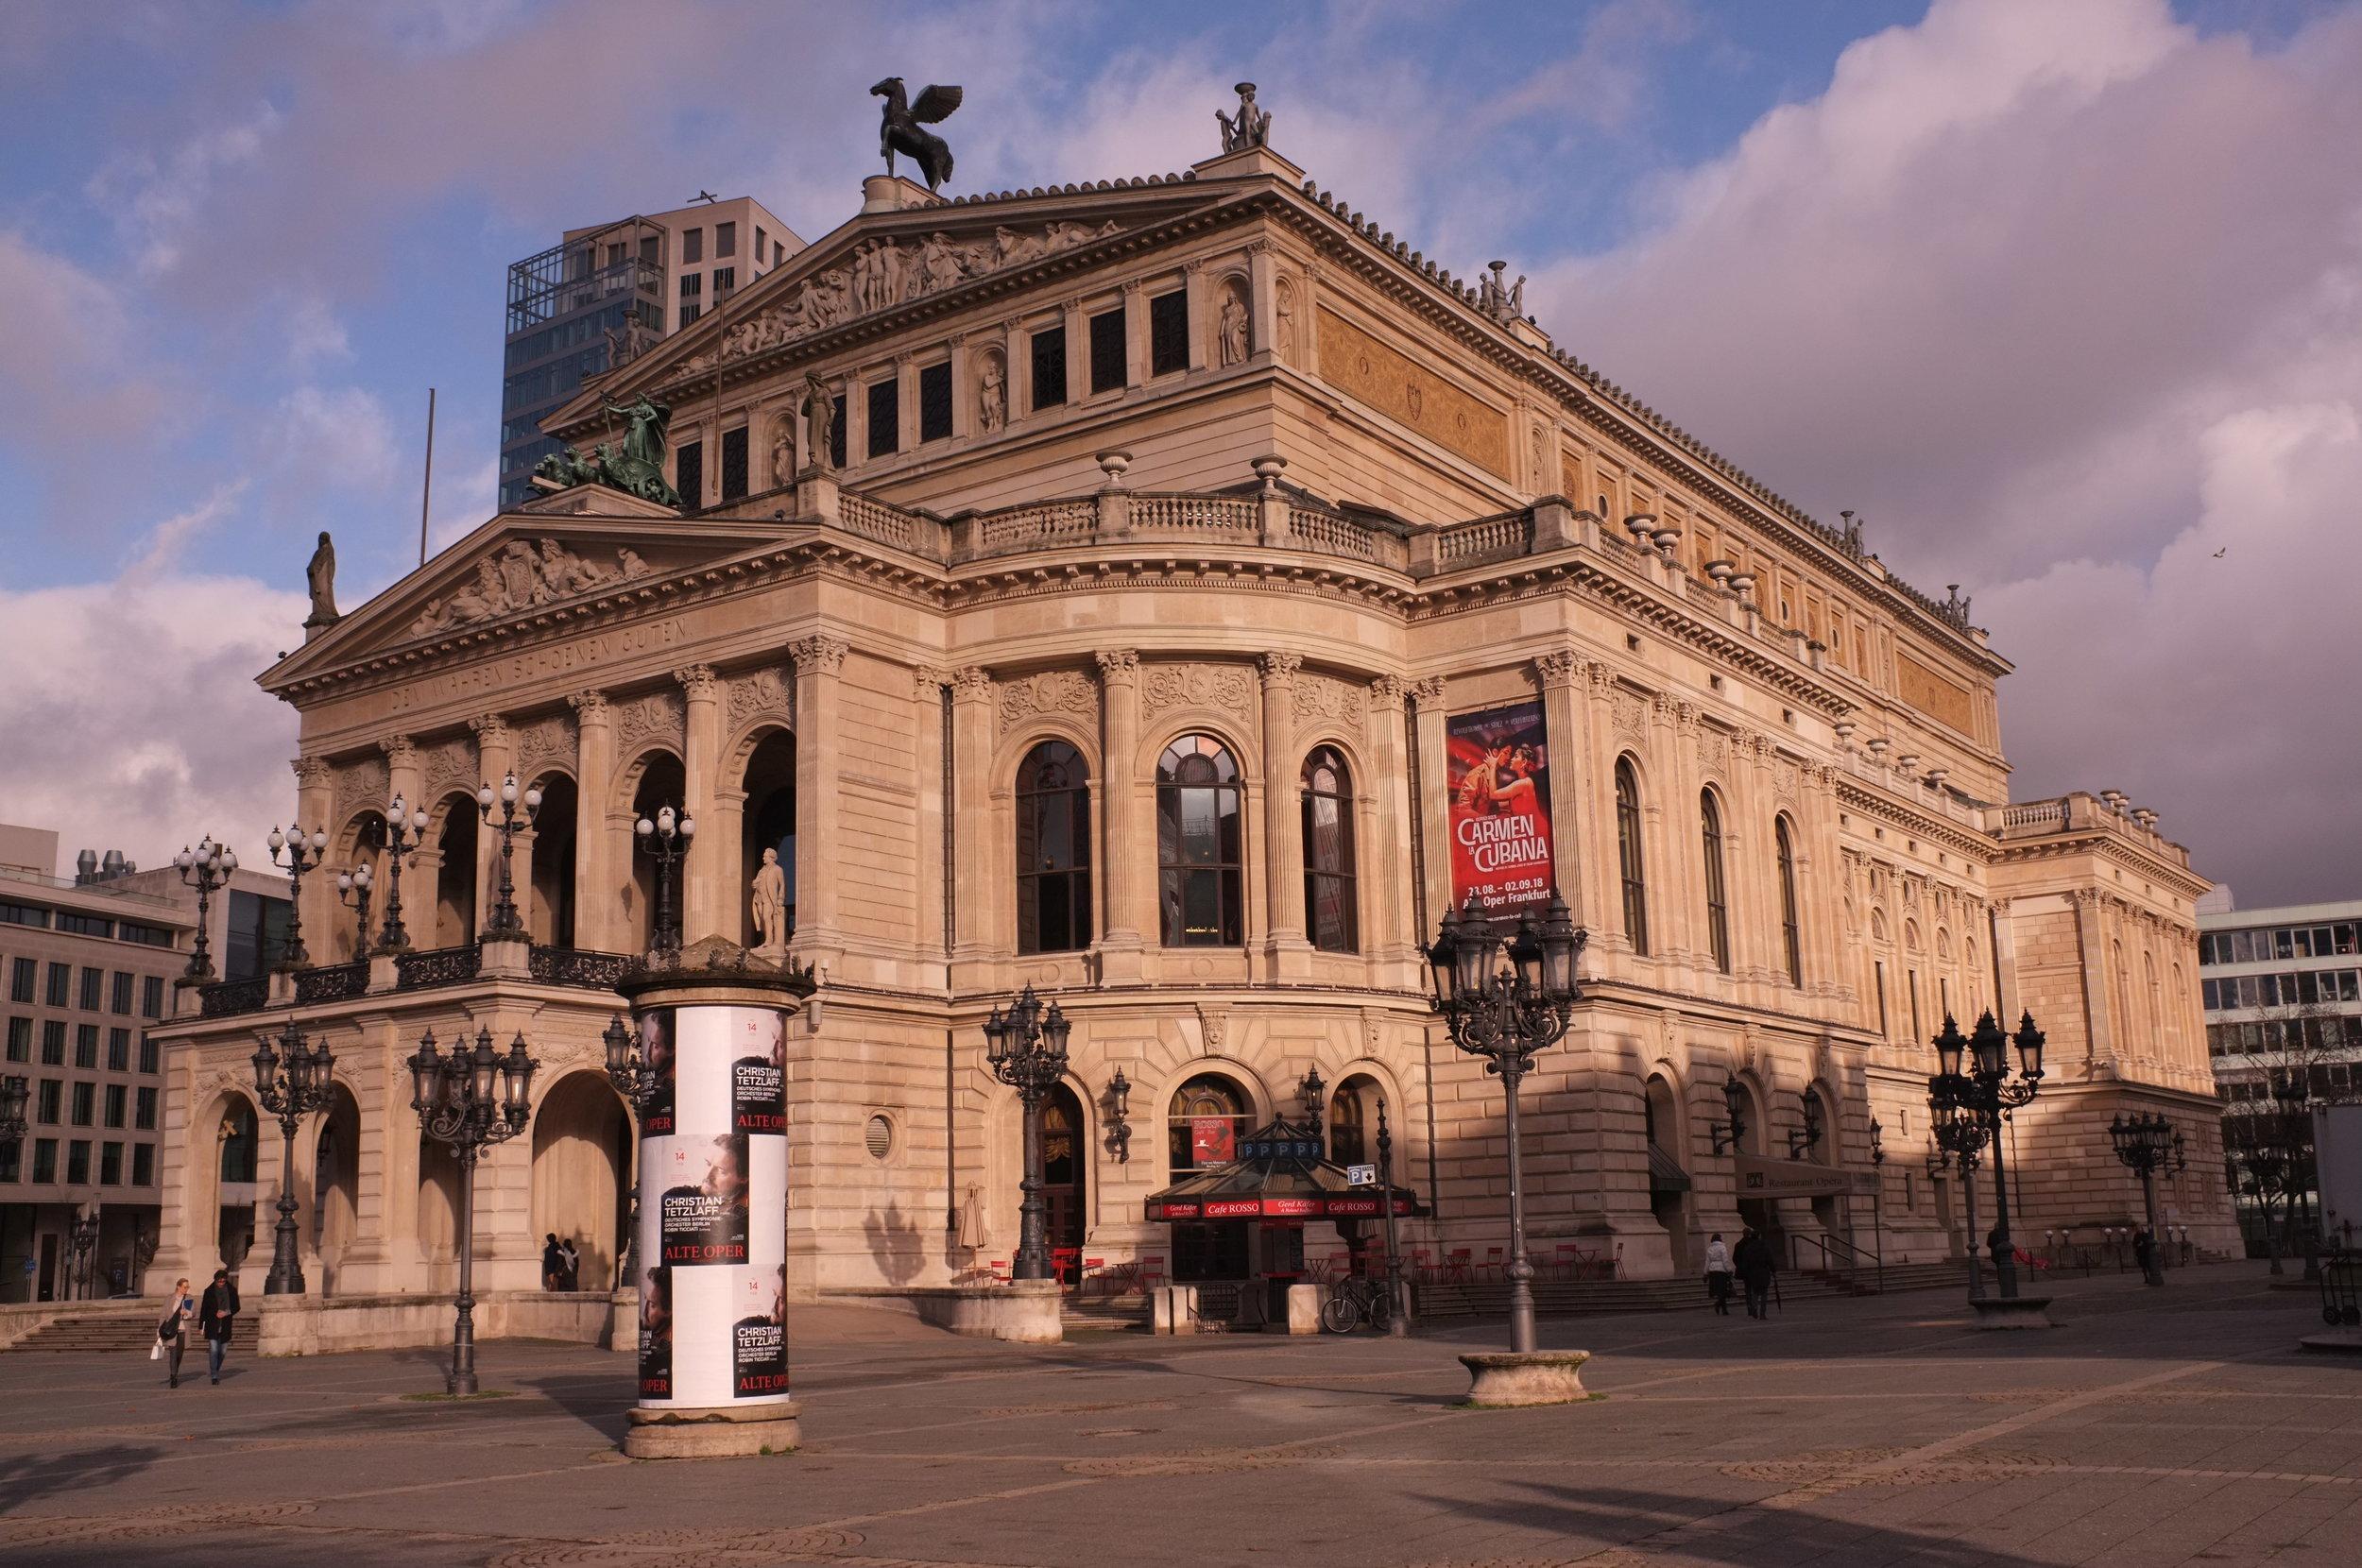 Alte Oper (Old Opera House)